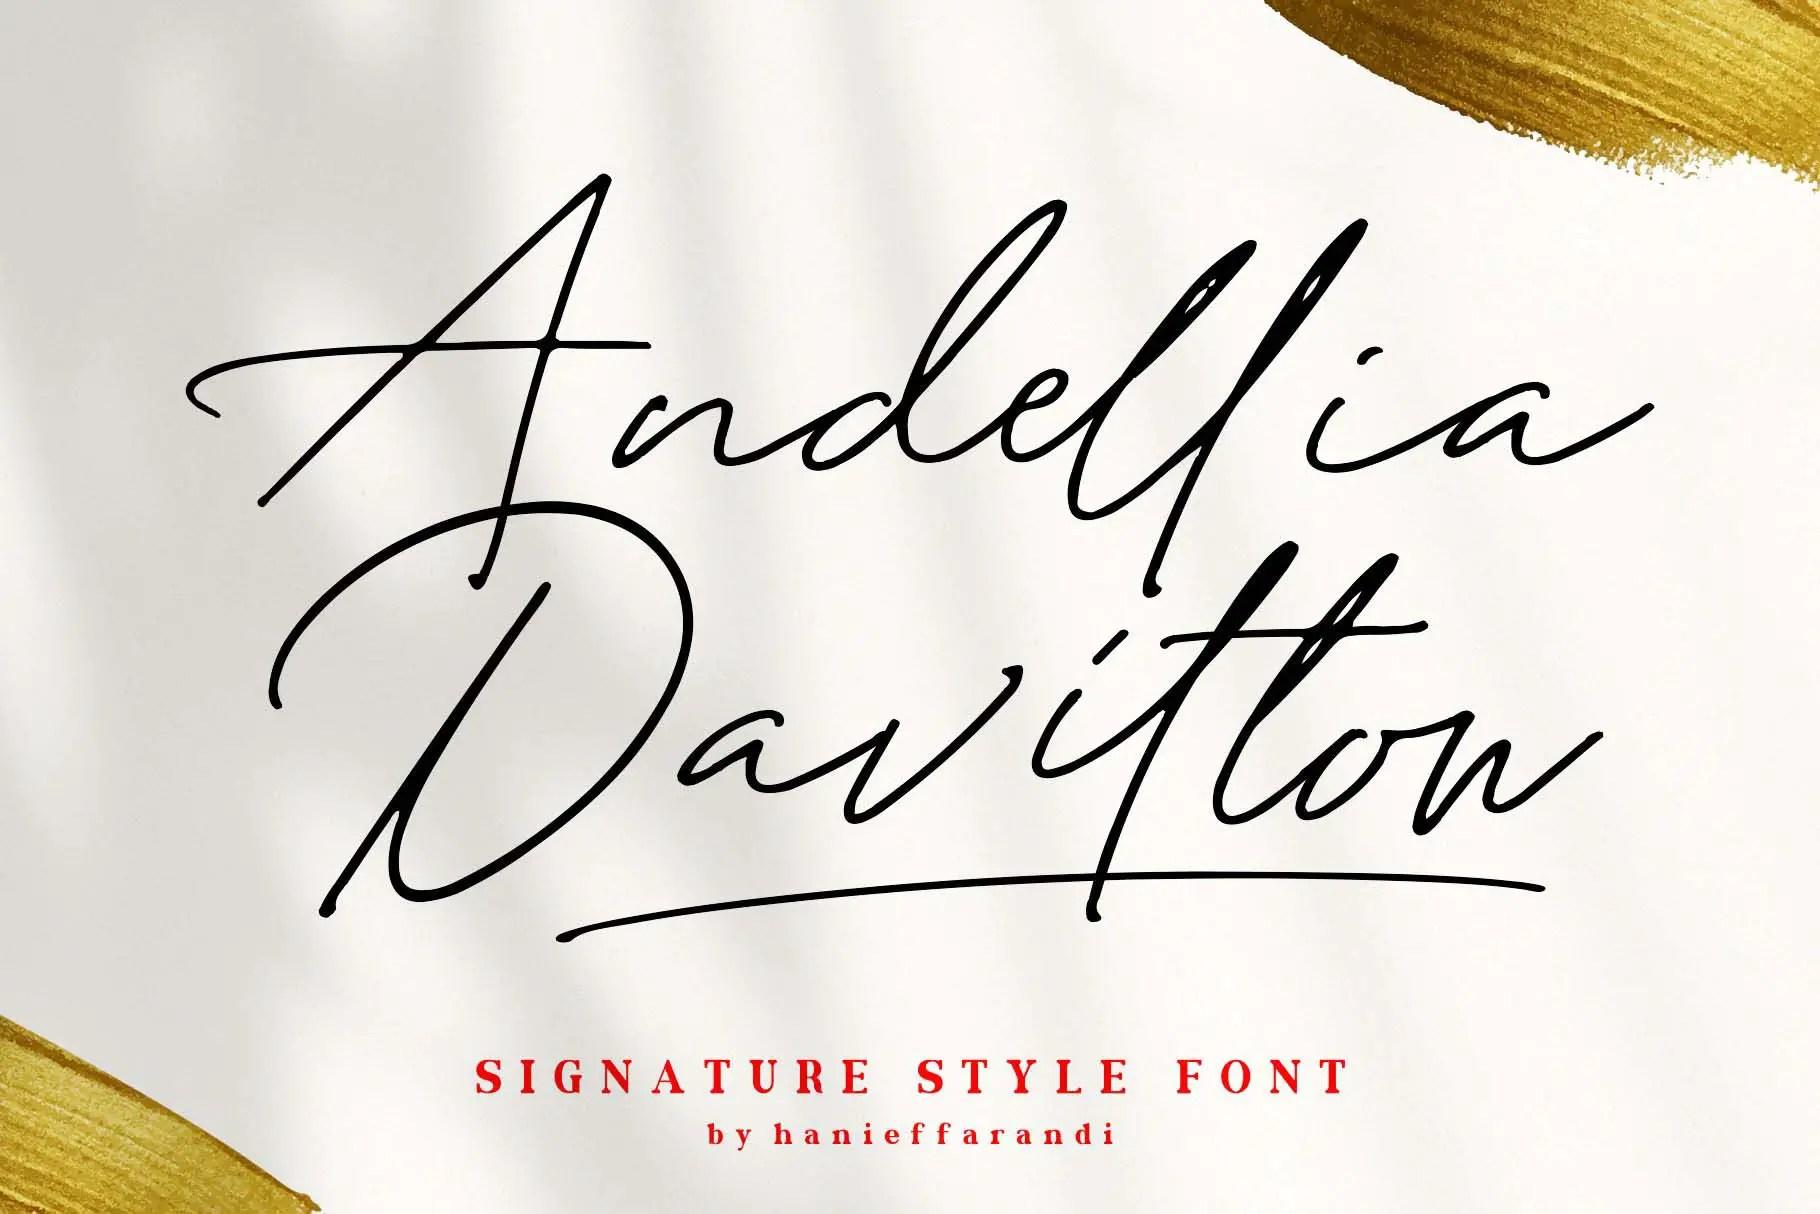 Andellia Davilton